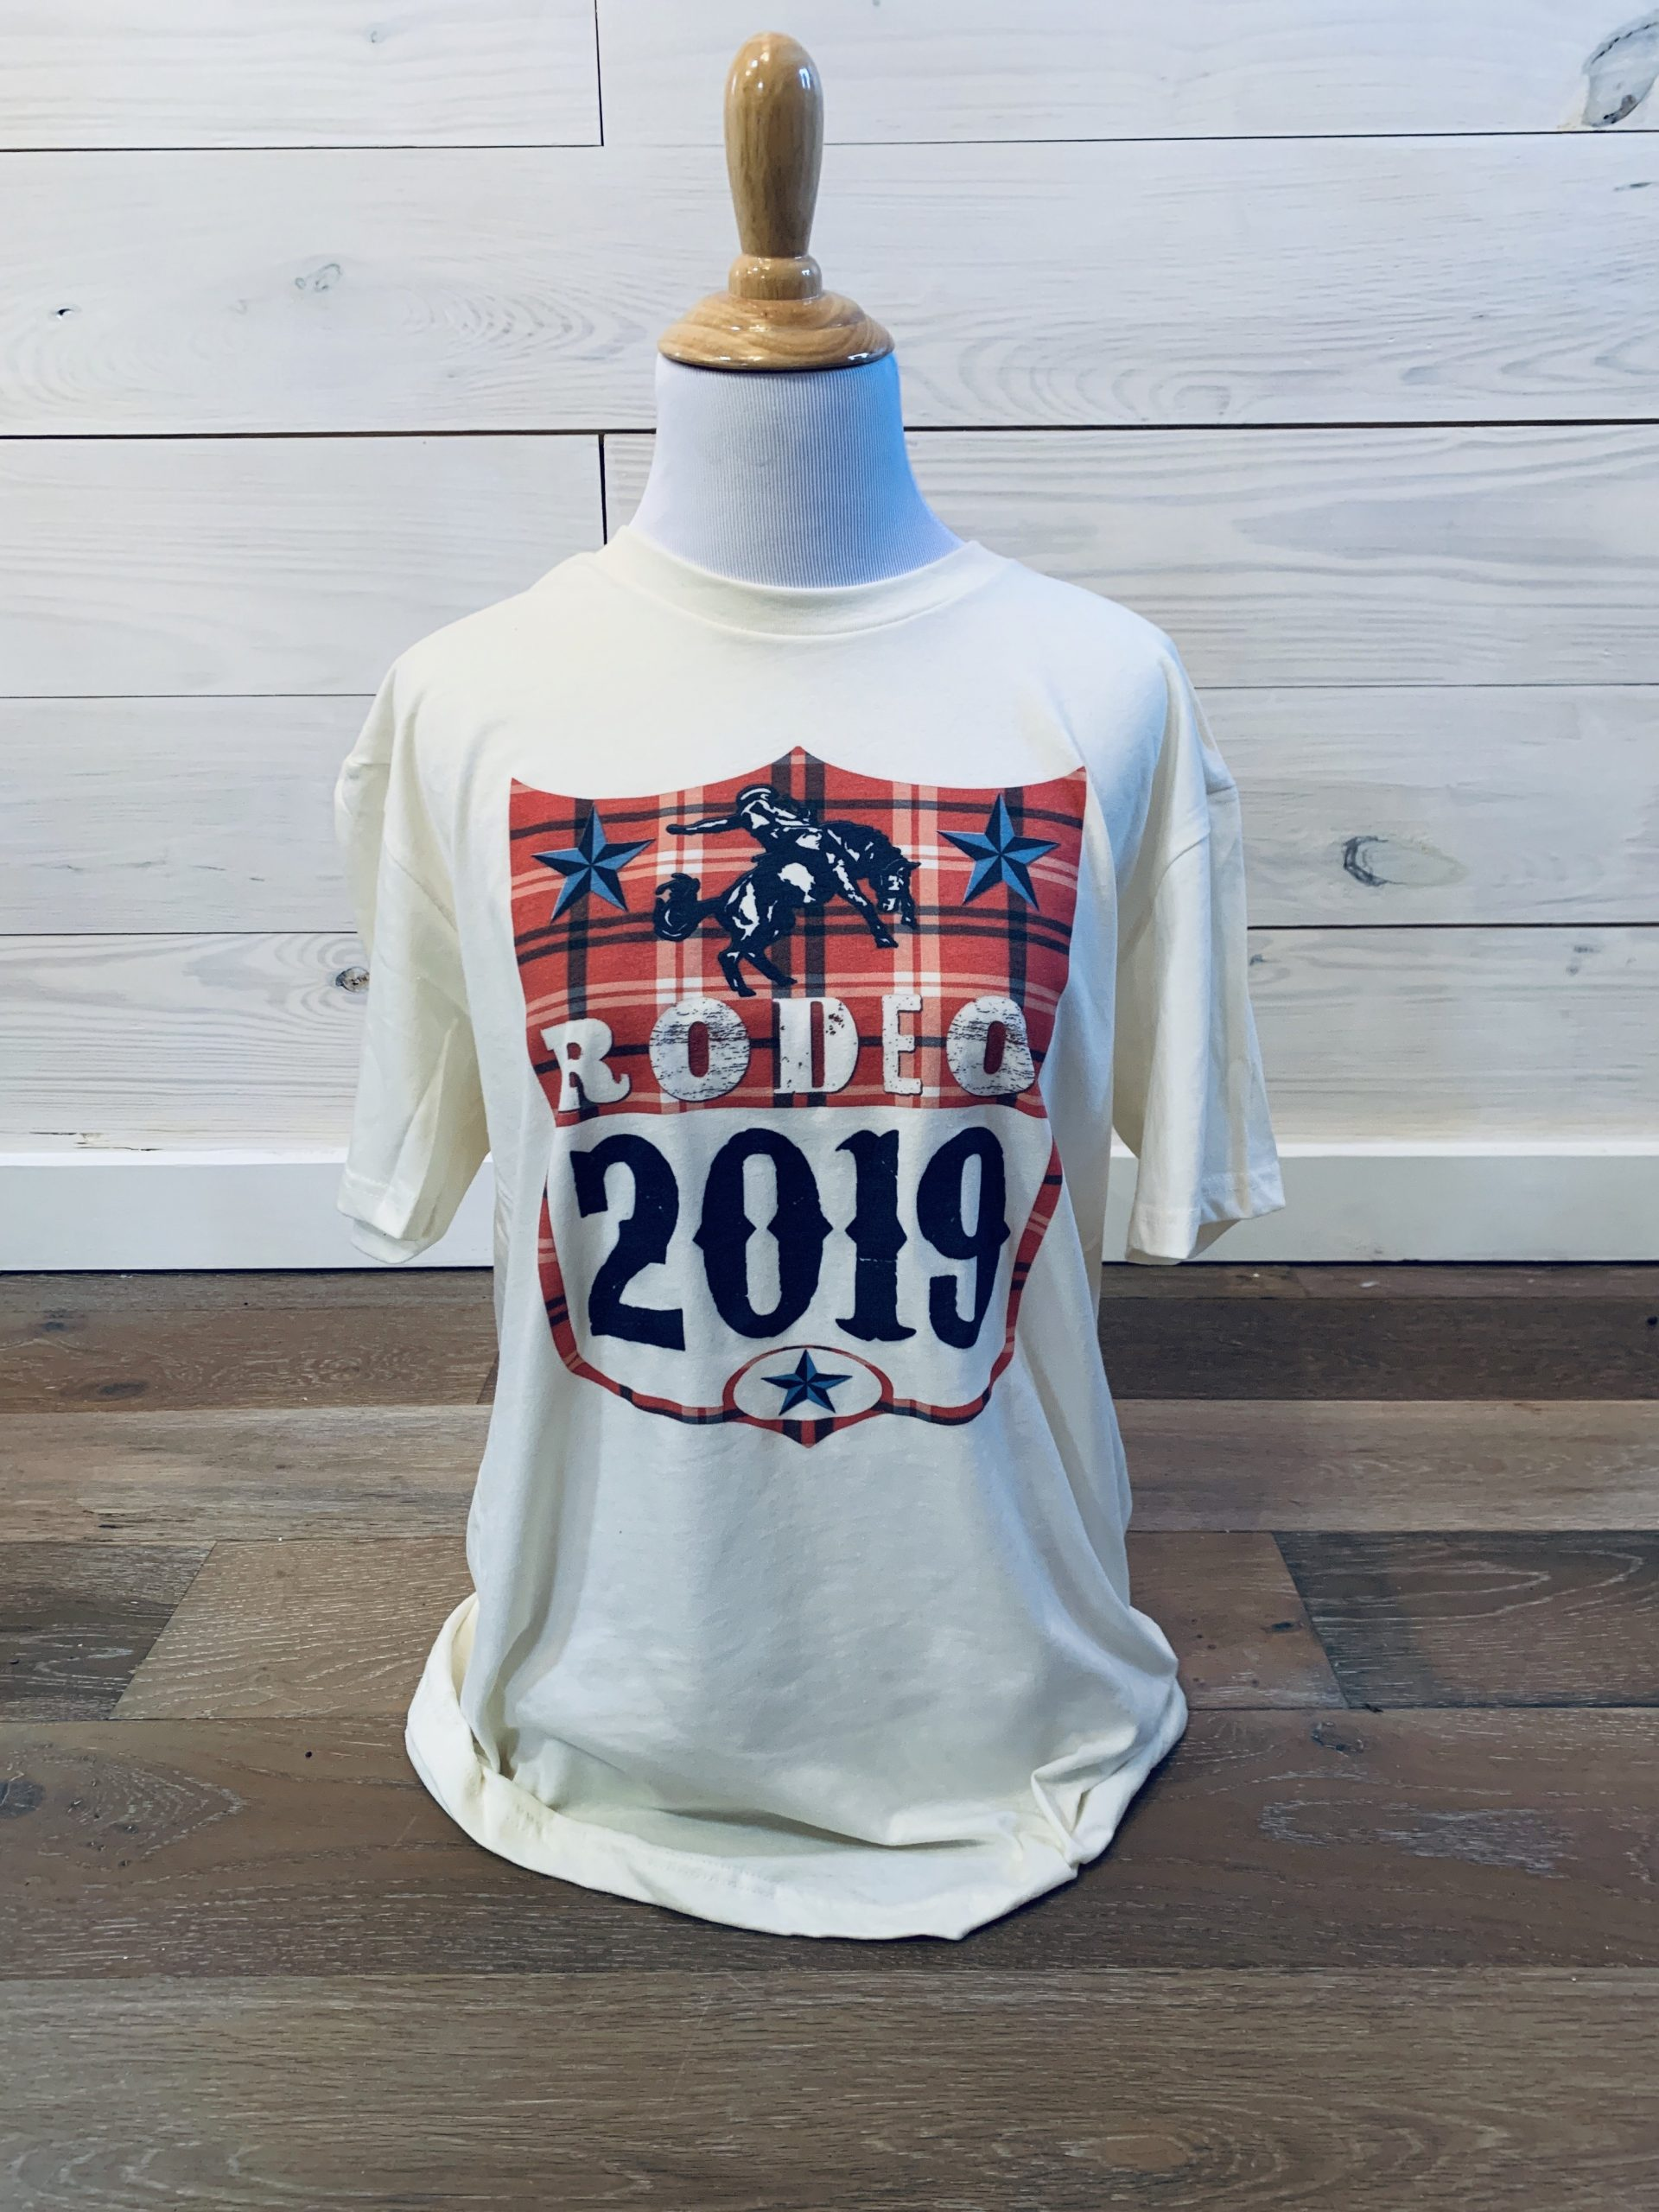 Rodeo 2019 on White Unisex Tee